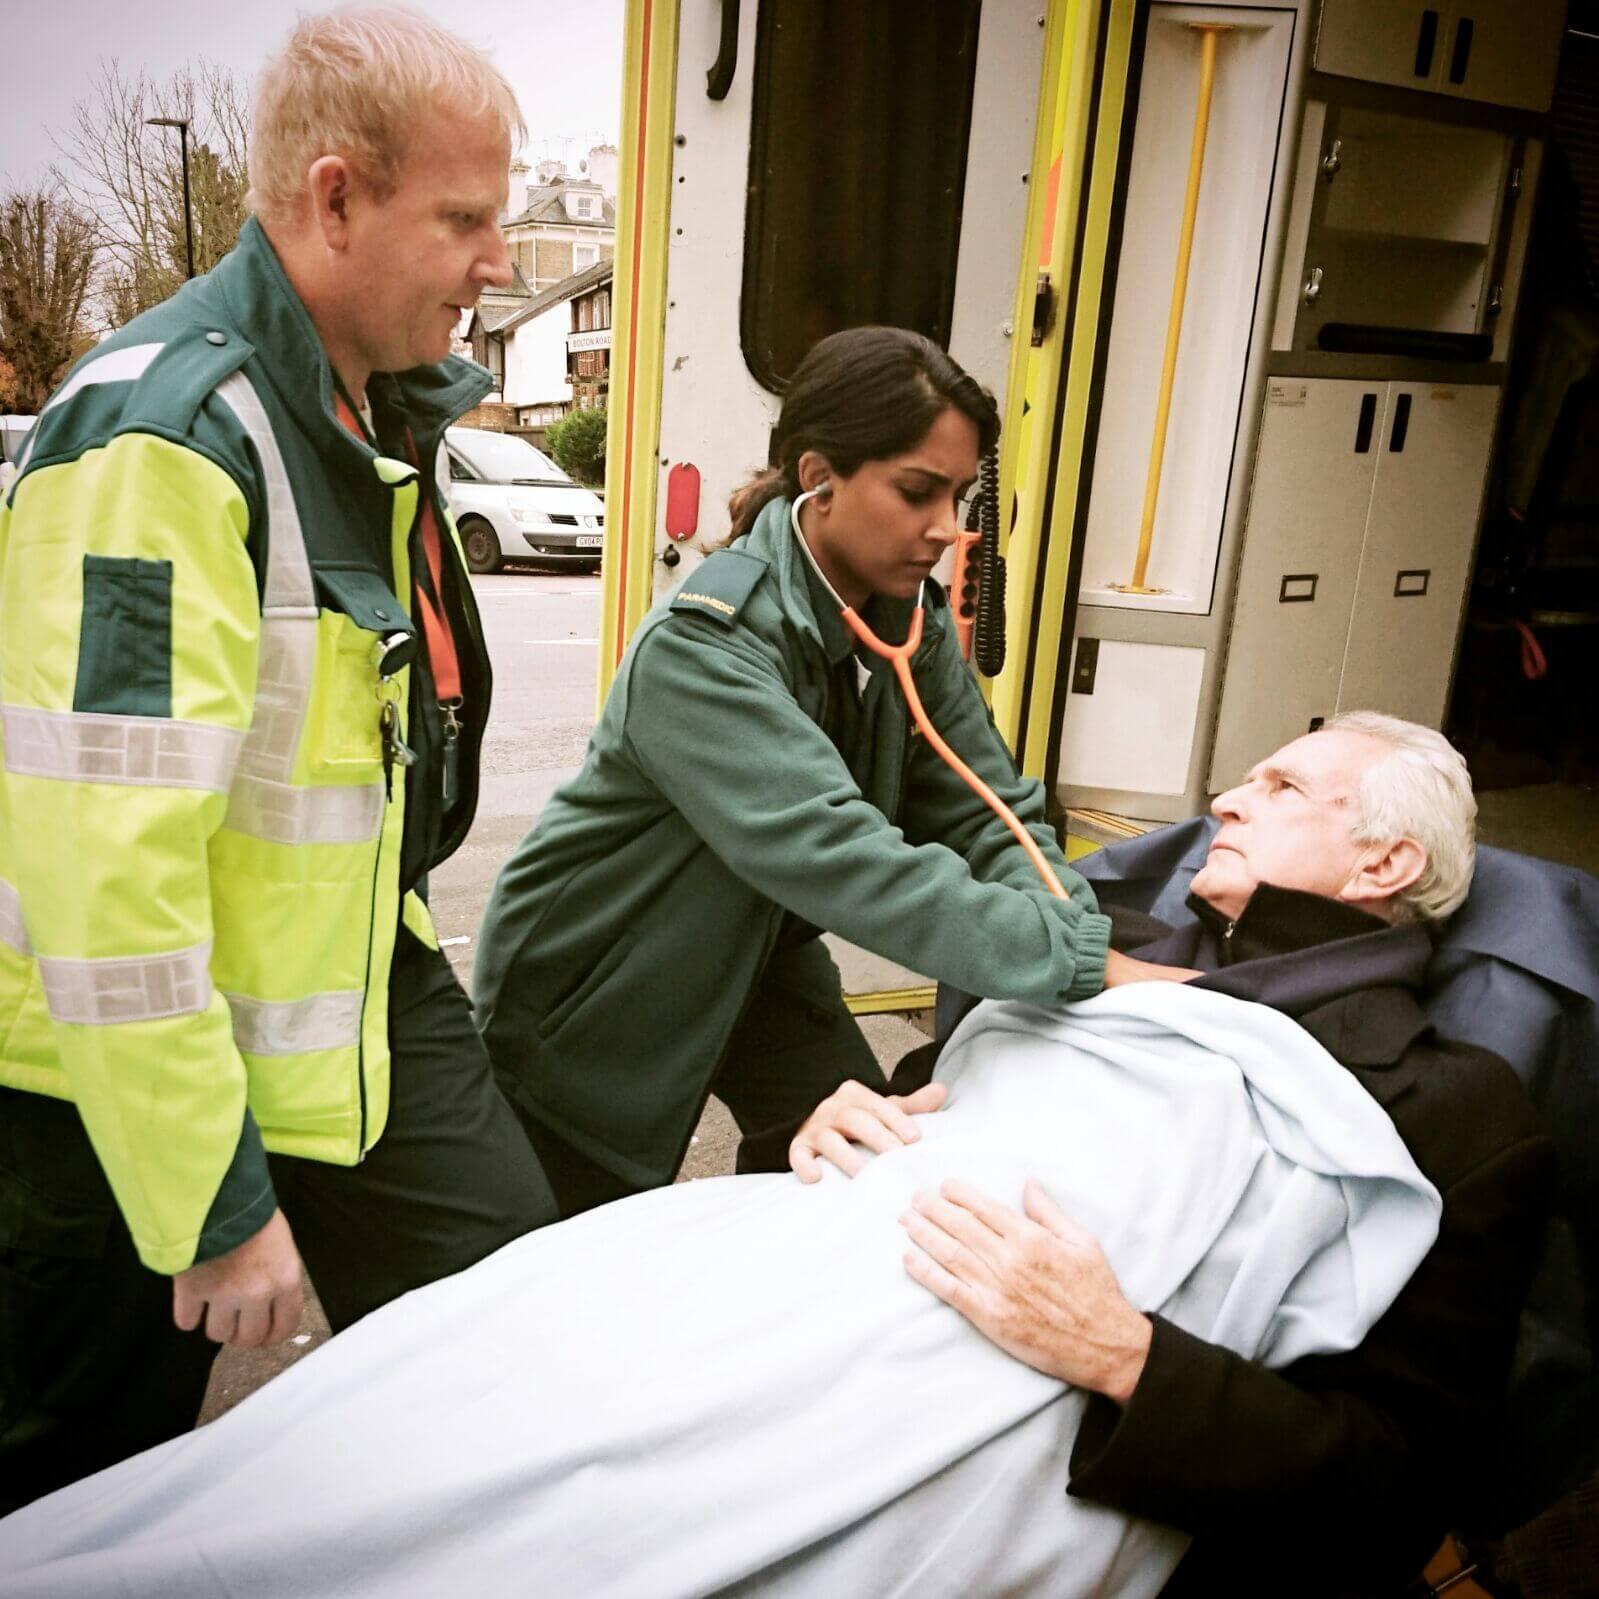 Filming Ambulance Staff Hire